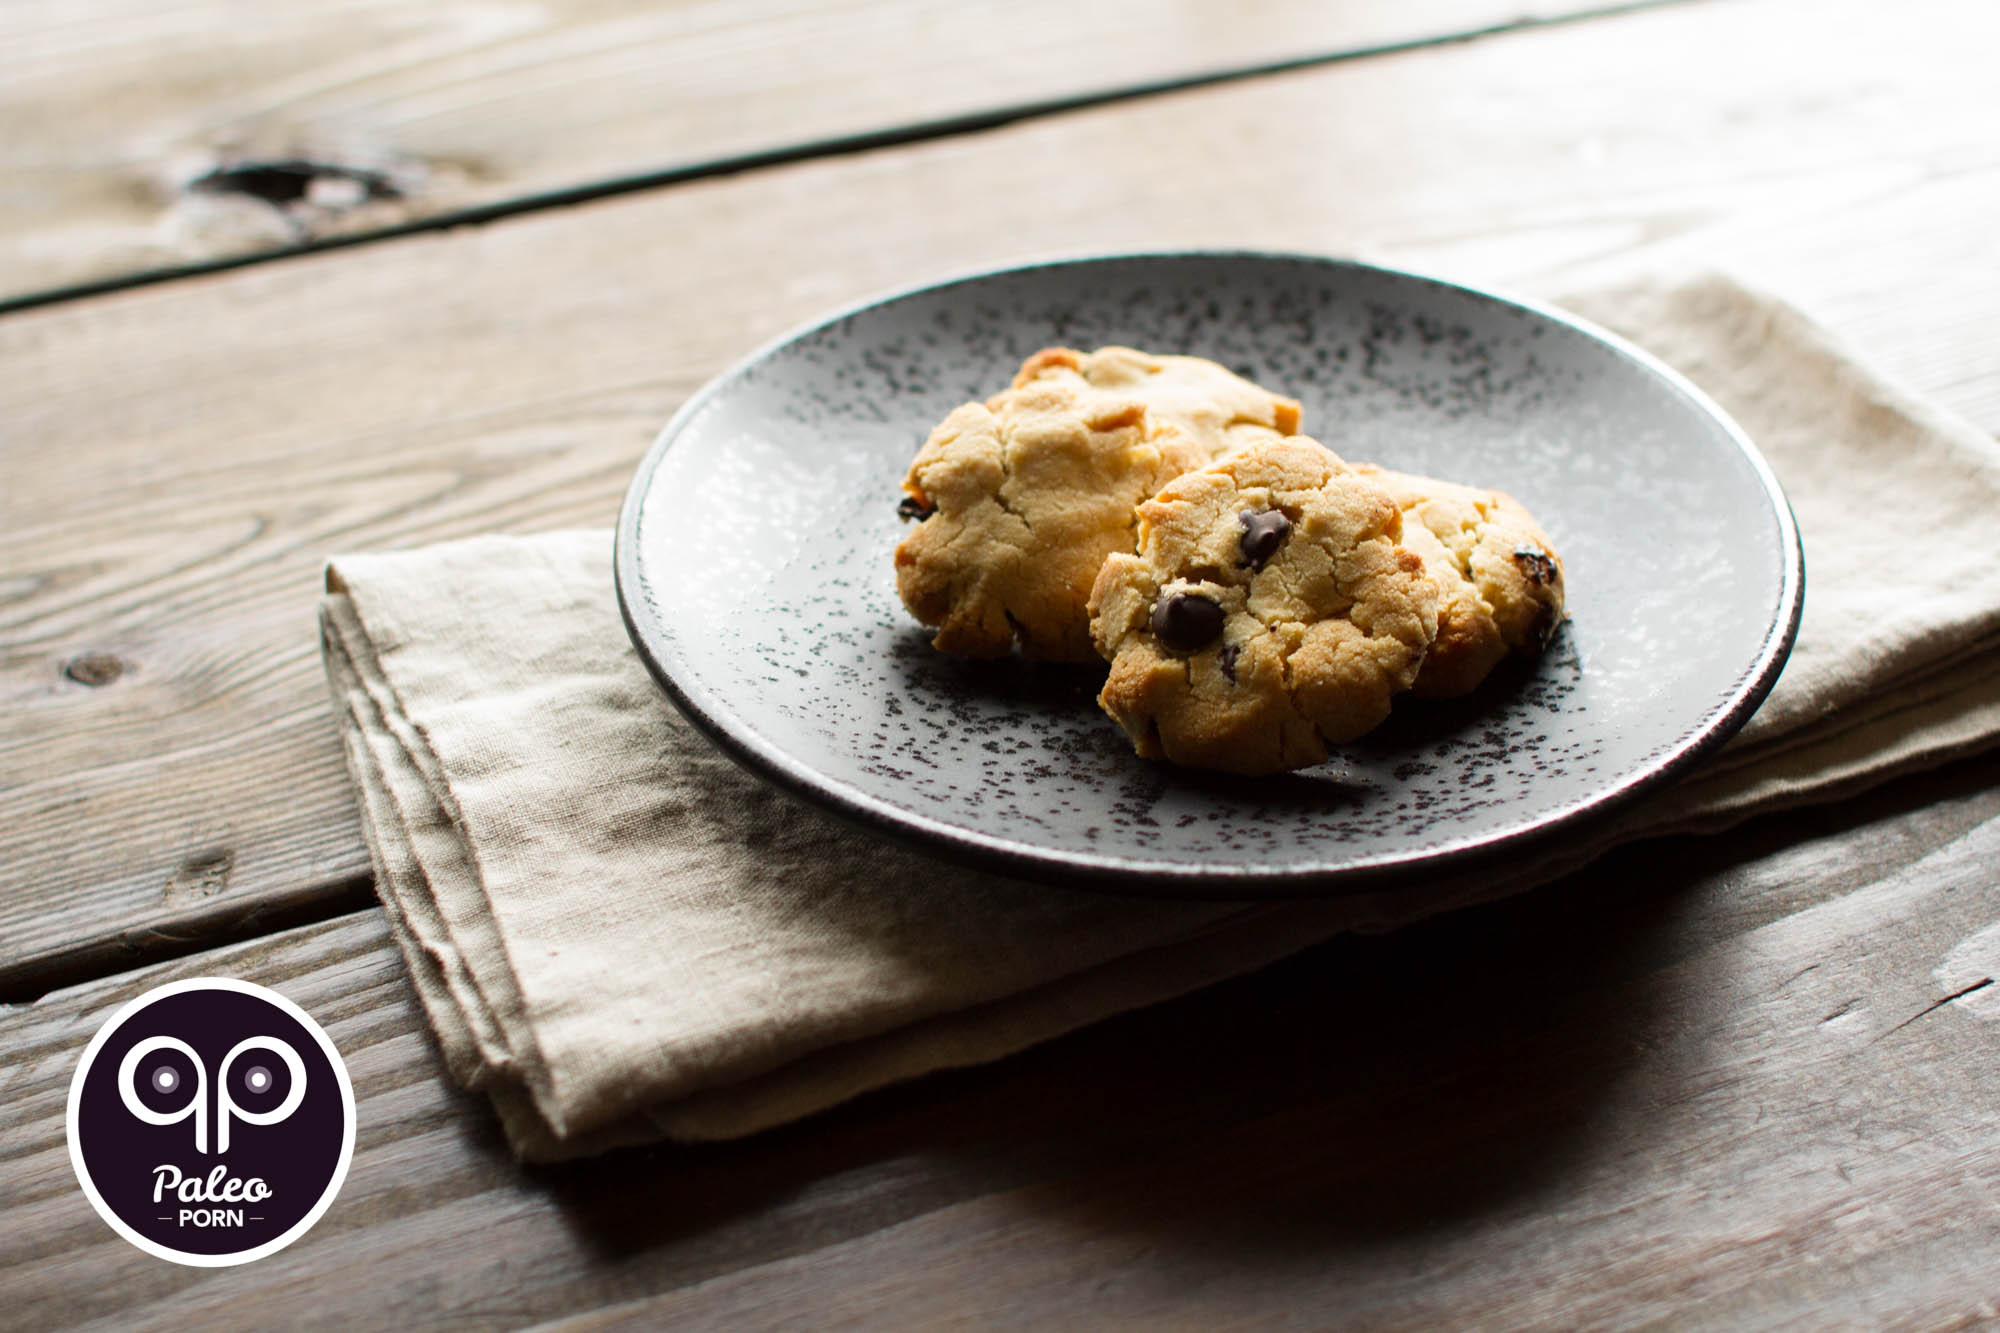 Paleo Chocolate Chip Cookies (Egg & Dairy Free) - Paleo Porn ...